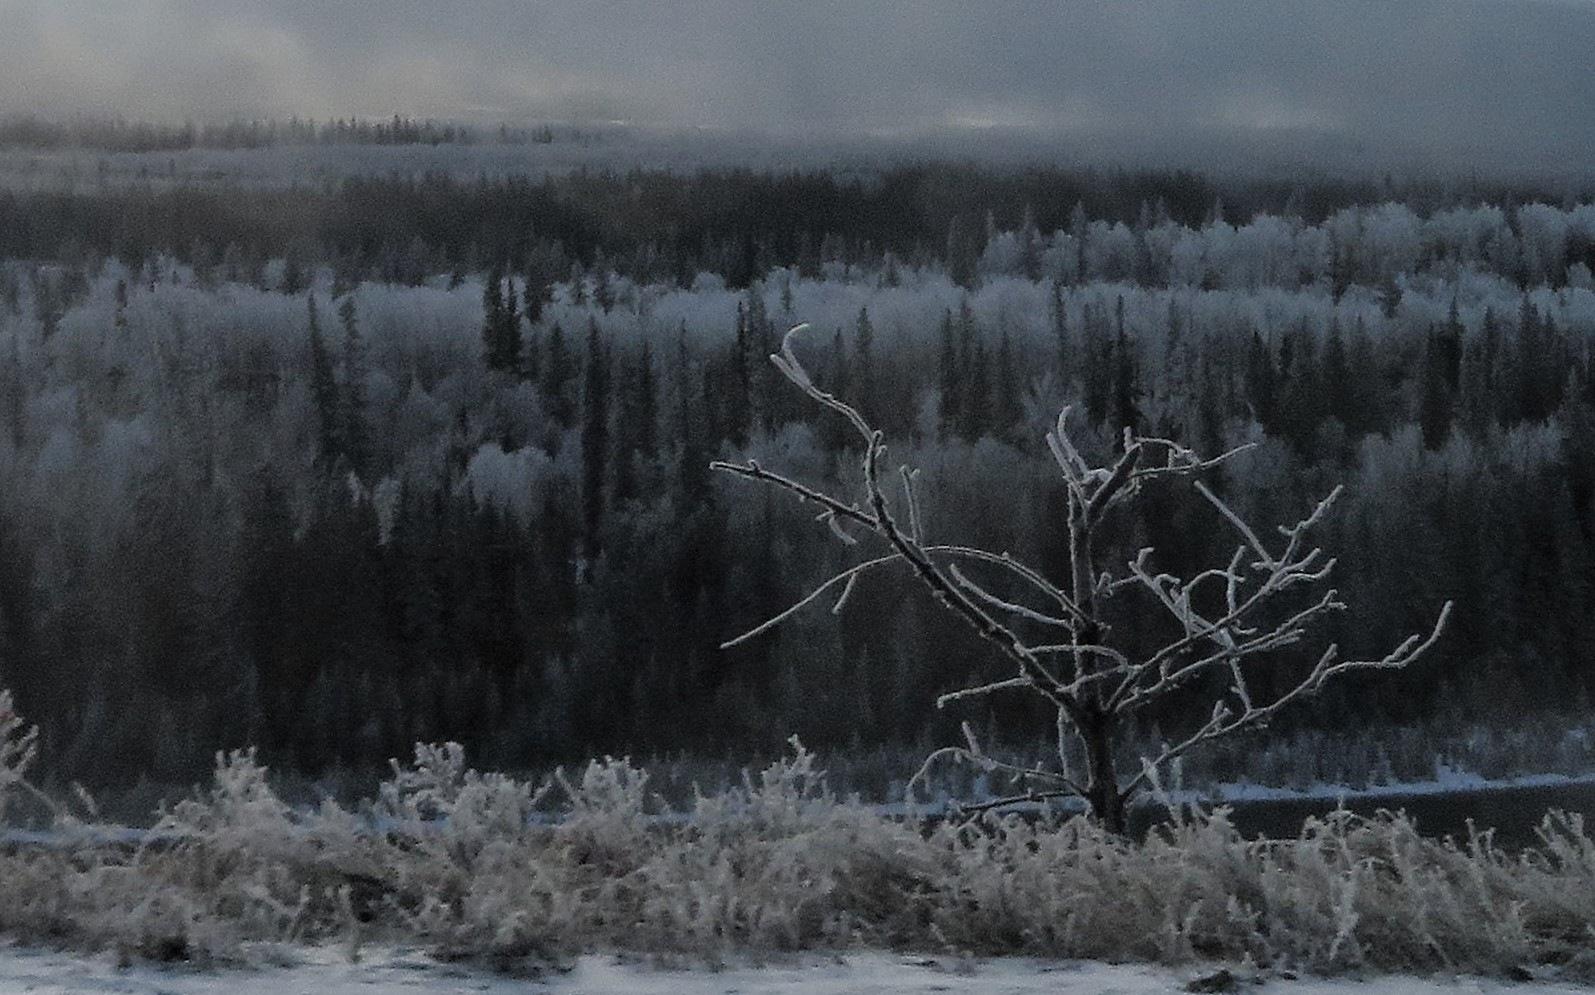 Frosty morning by susan soderstrom